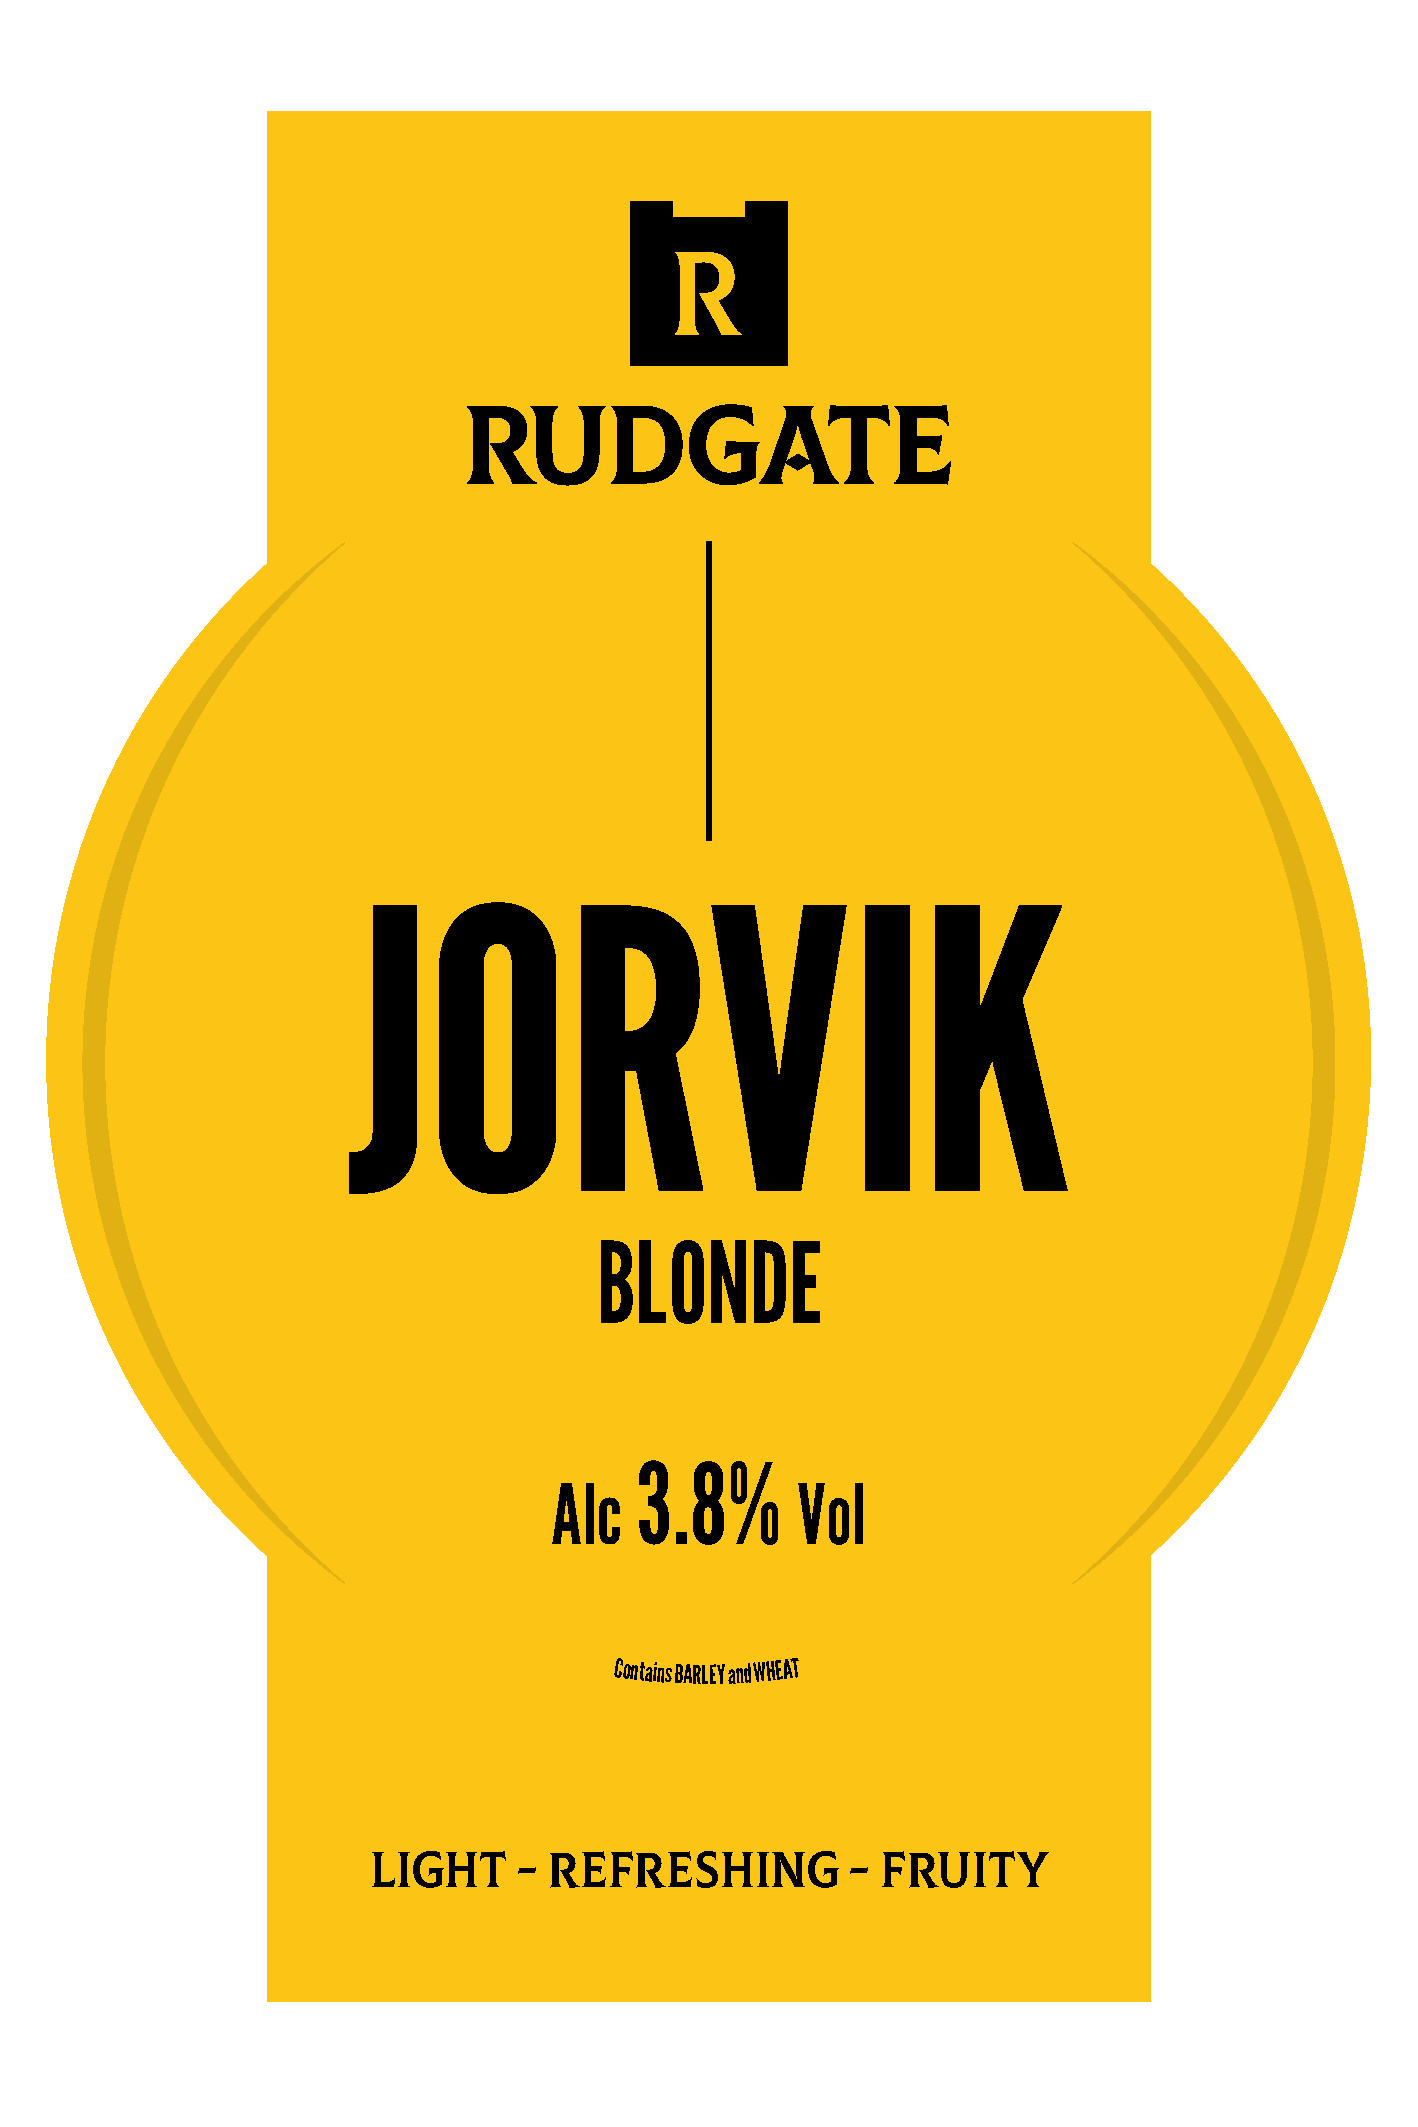 Rudgate Jorvik Blonde 9 Gallons Blonde  3.8%